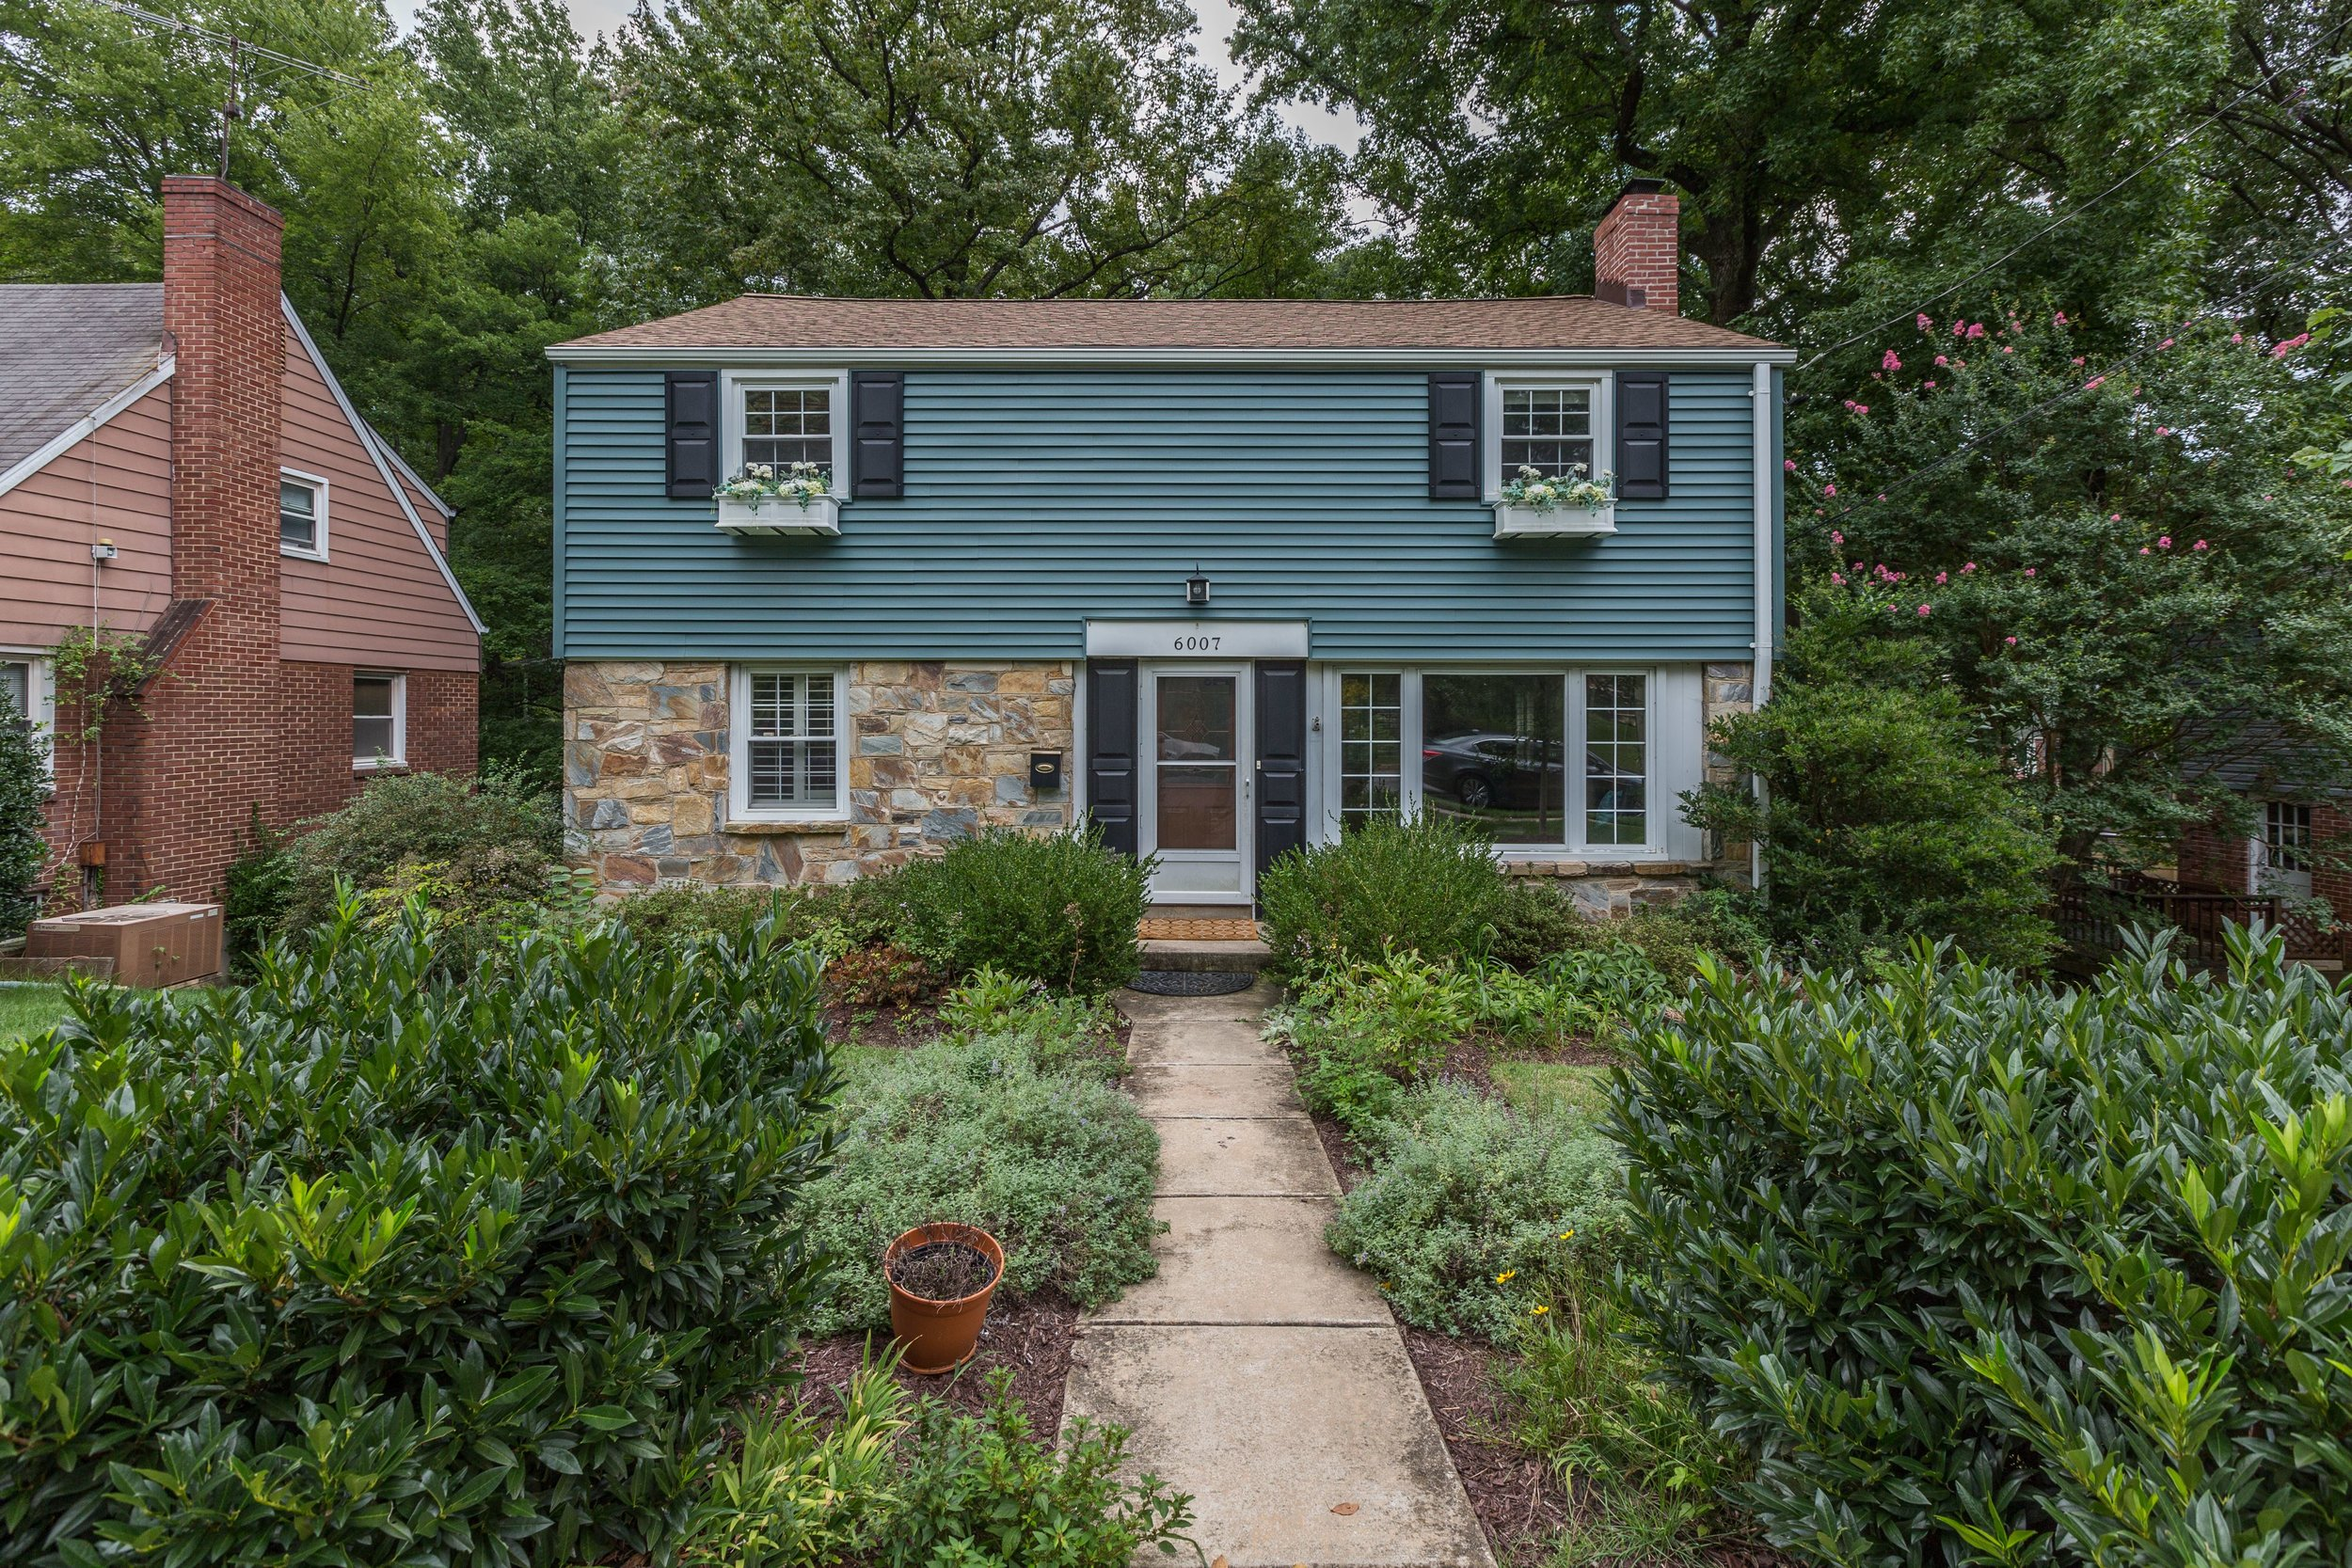 6007 Hawthorne St. NE - $420,000